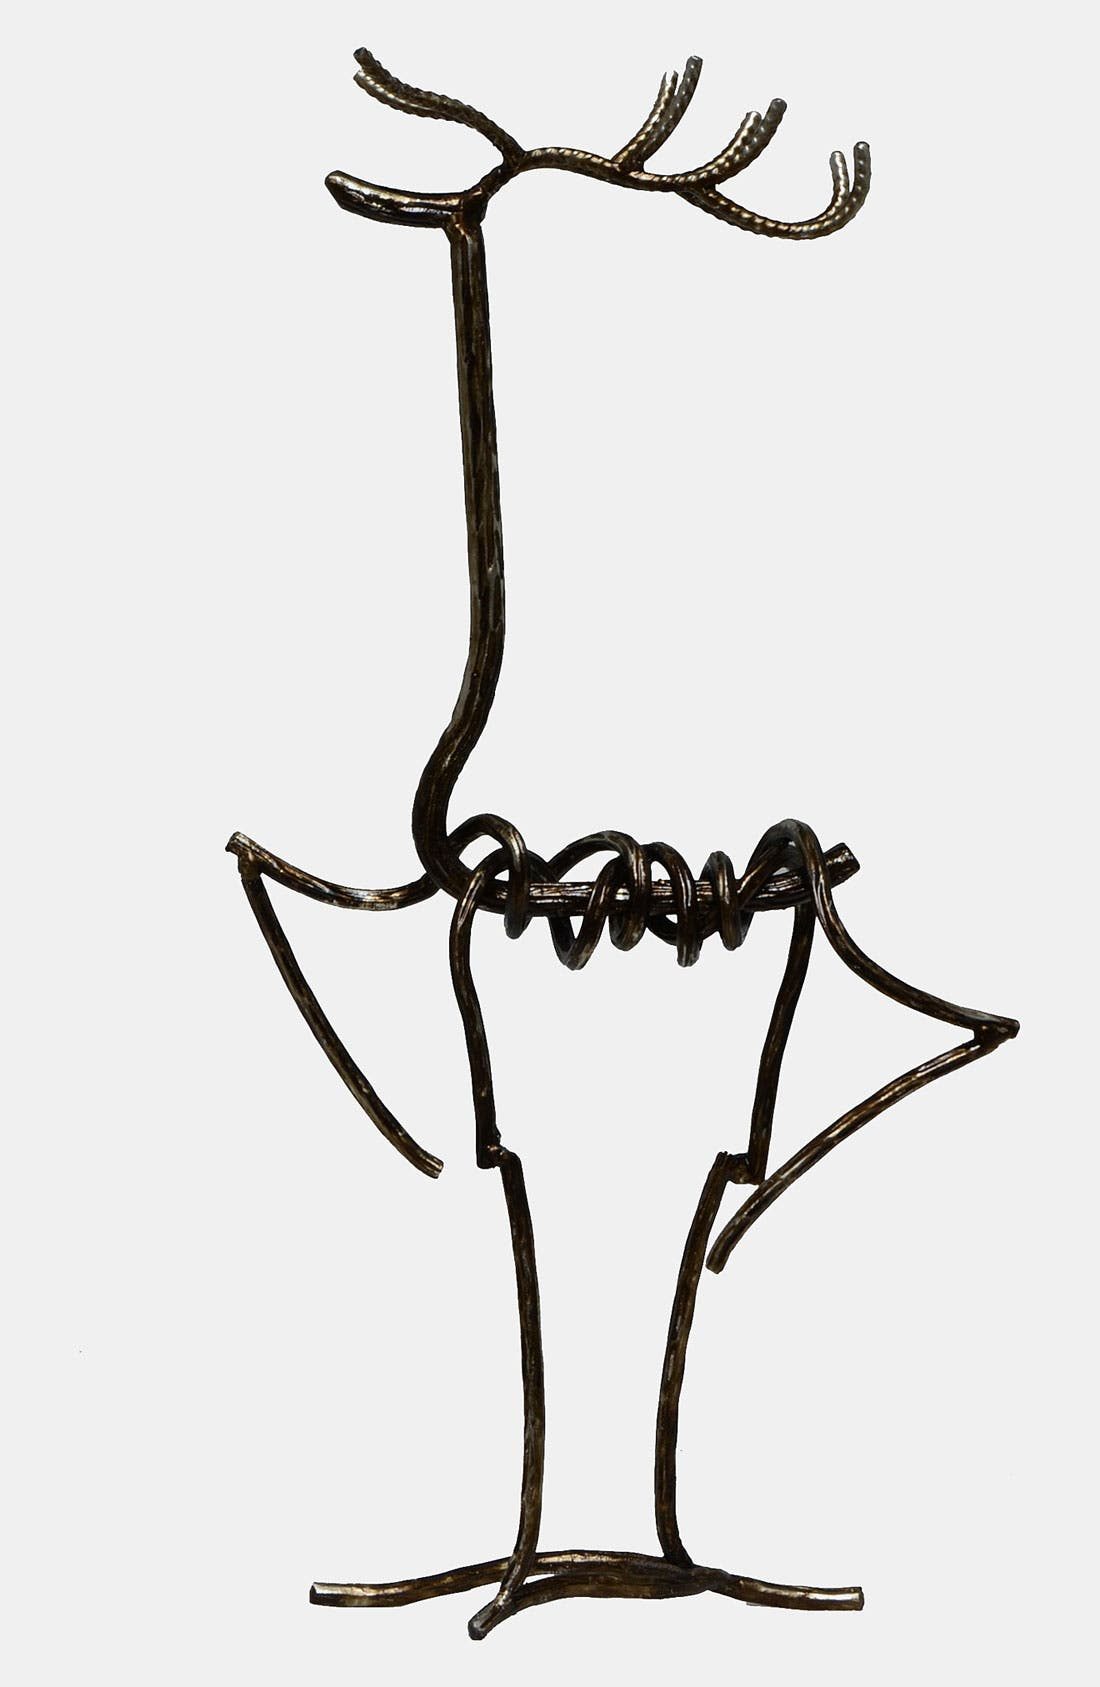 Alternate Image 1 Selected - Fantastic Craft Standing Deer Wire Figurine